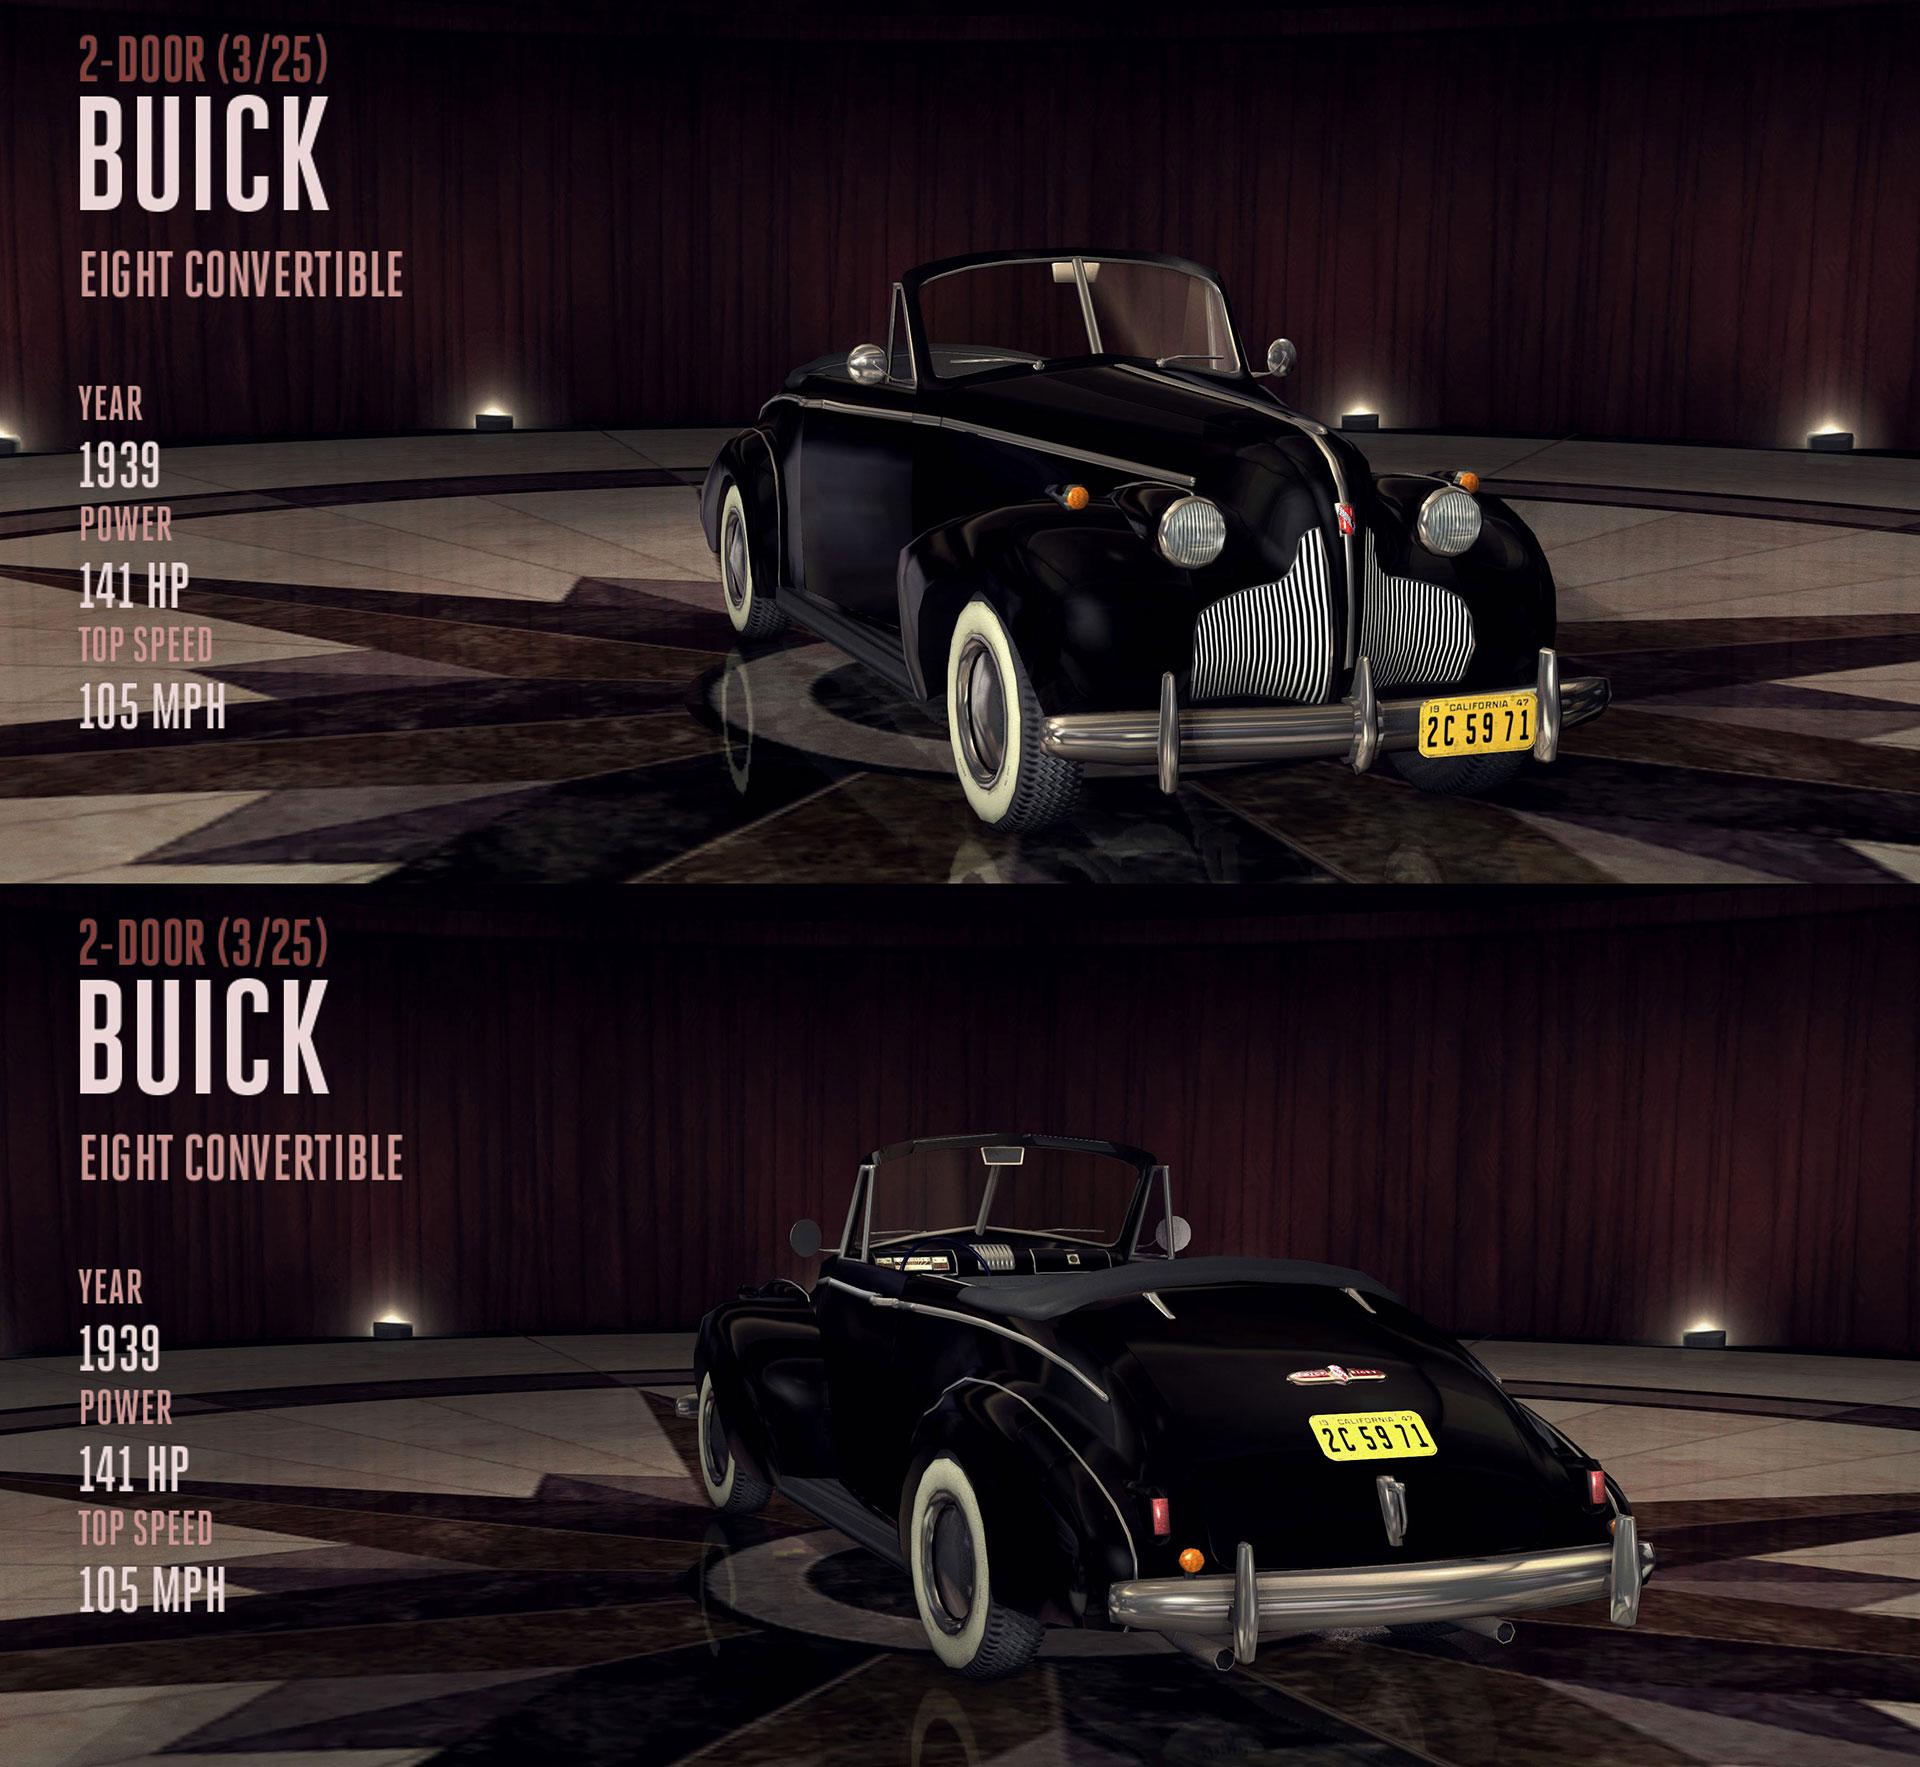 Buick Eight Convertible